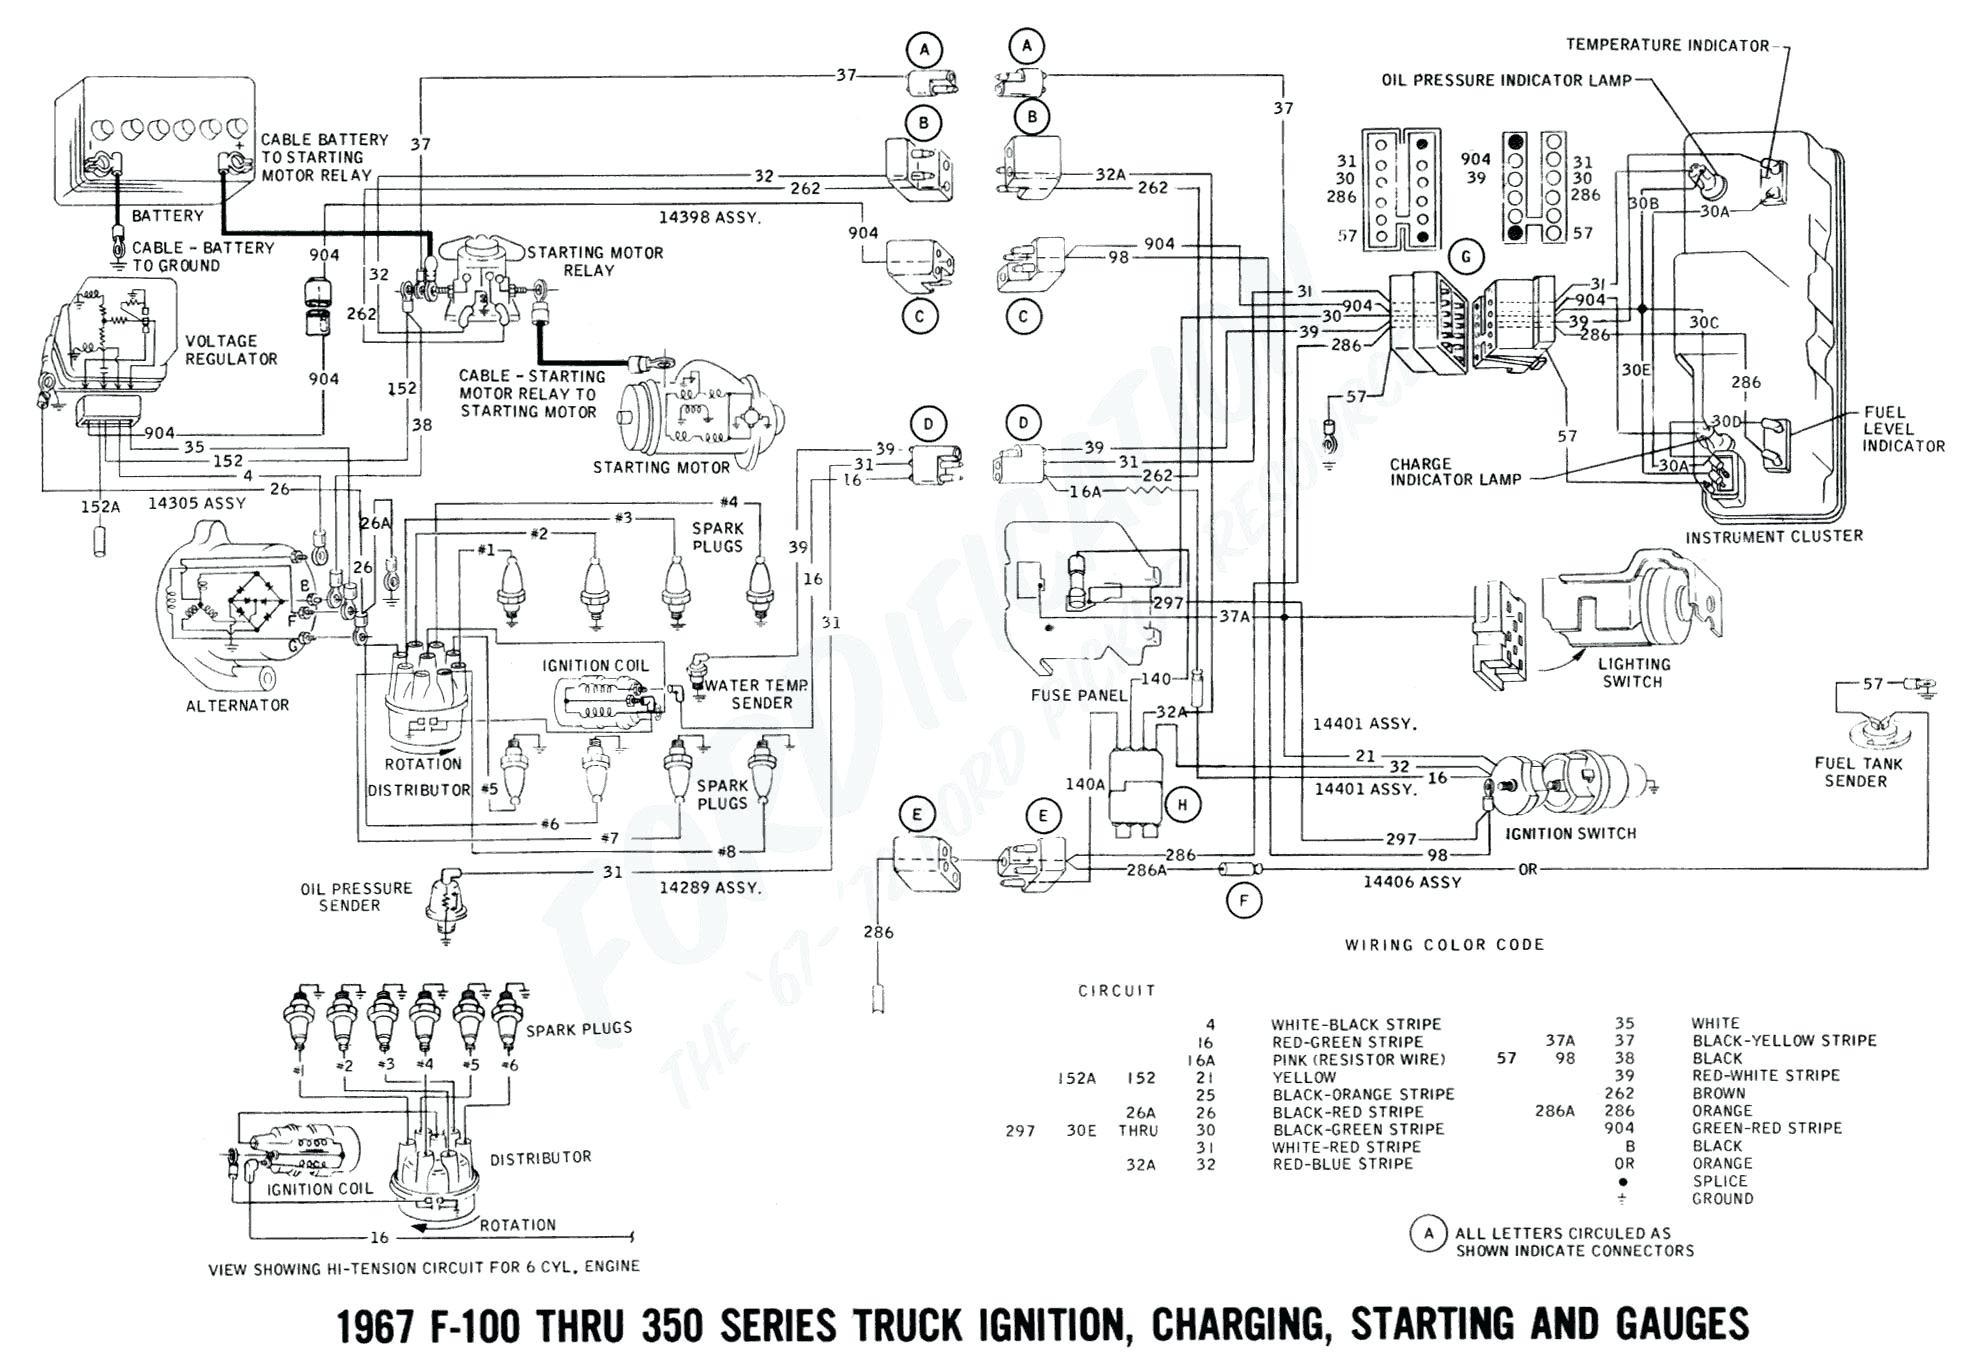 Ford Explorer Engine Diagram Wiring Diagram Fuse Drawings Wiring Info • Of Ford Explorer Engine Diagram